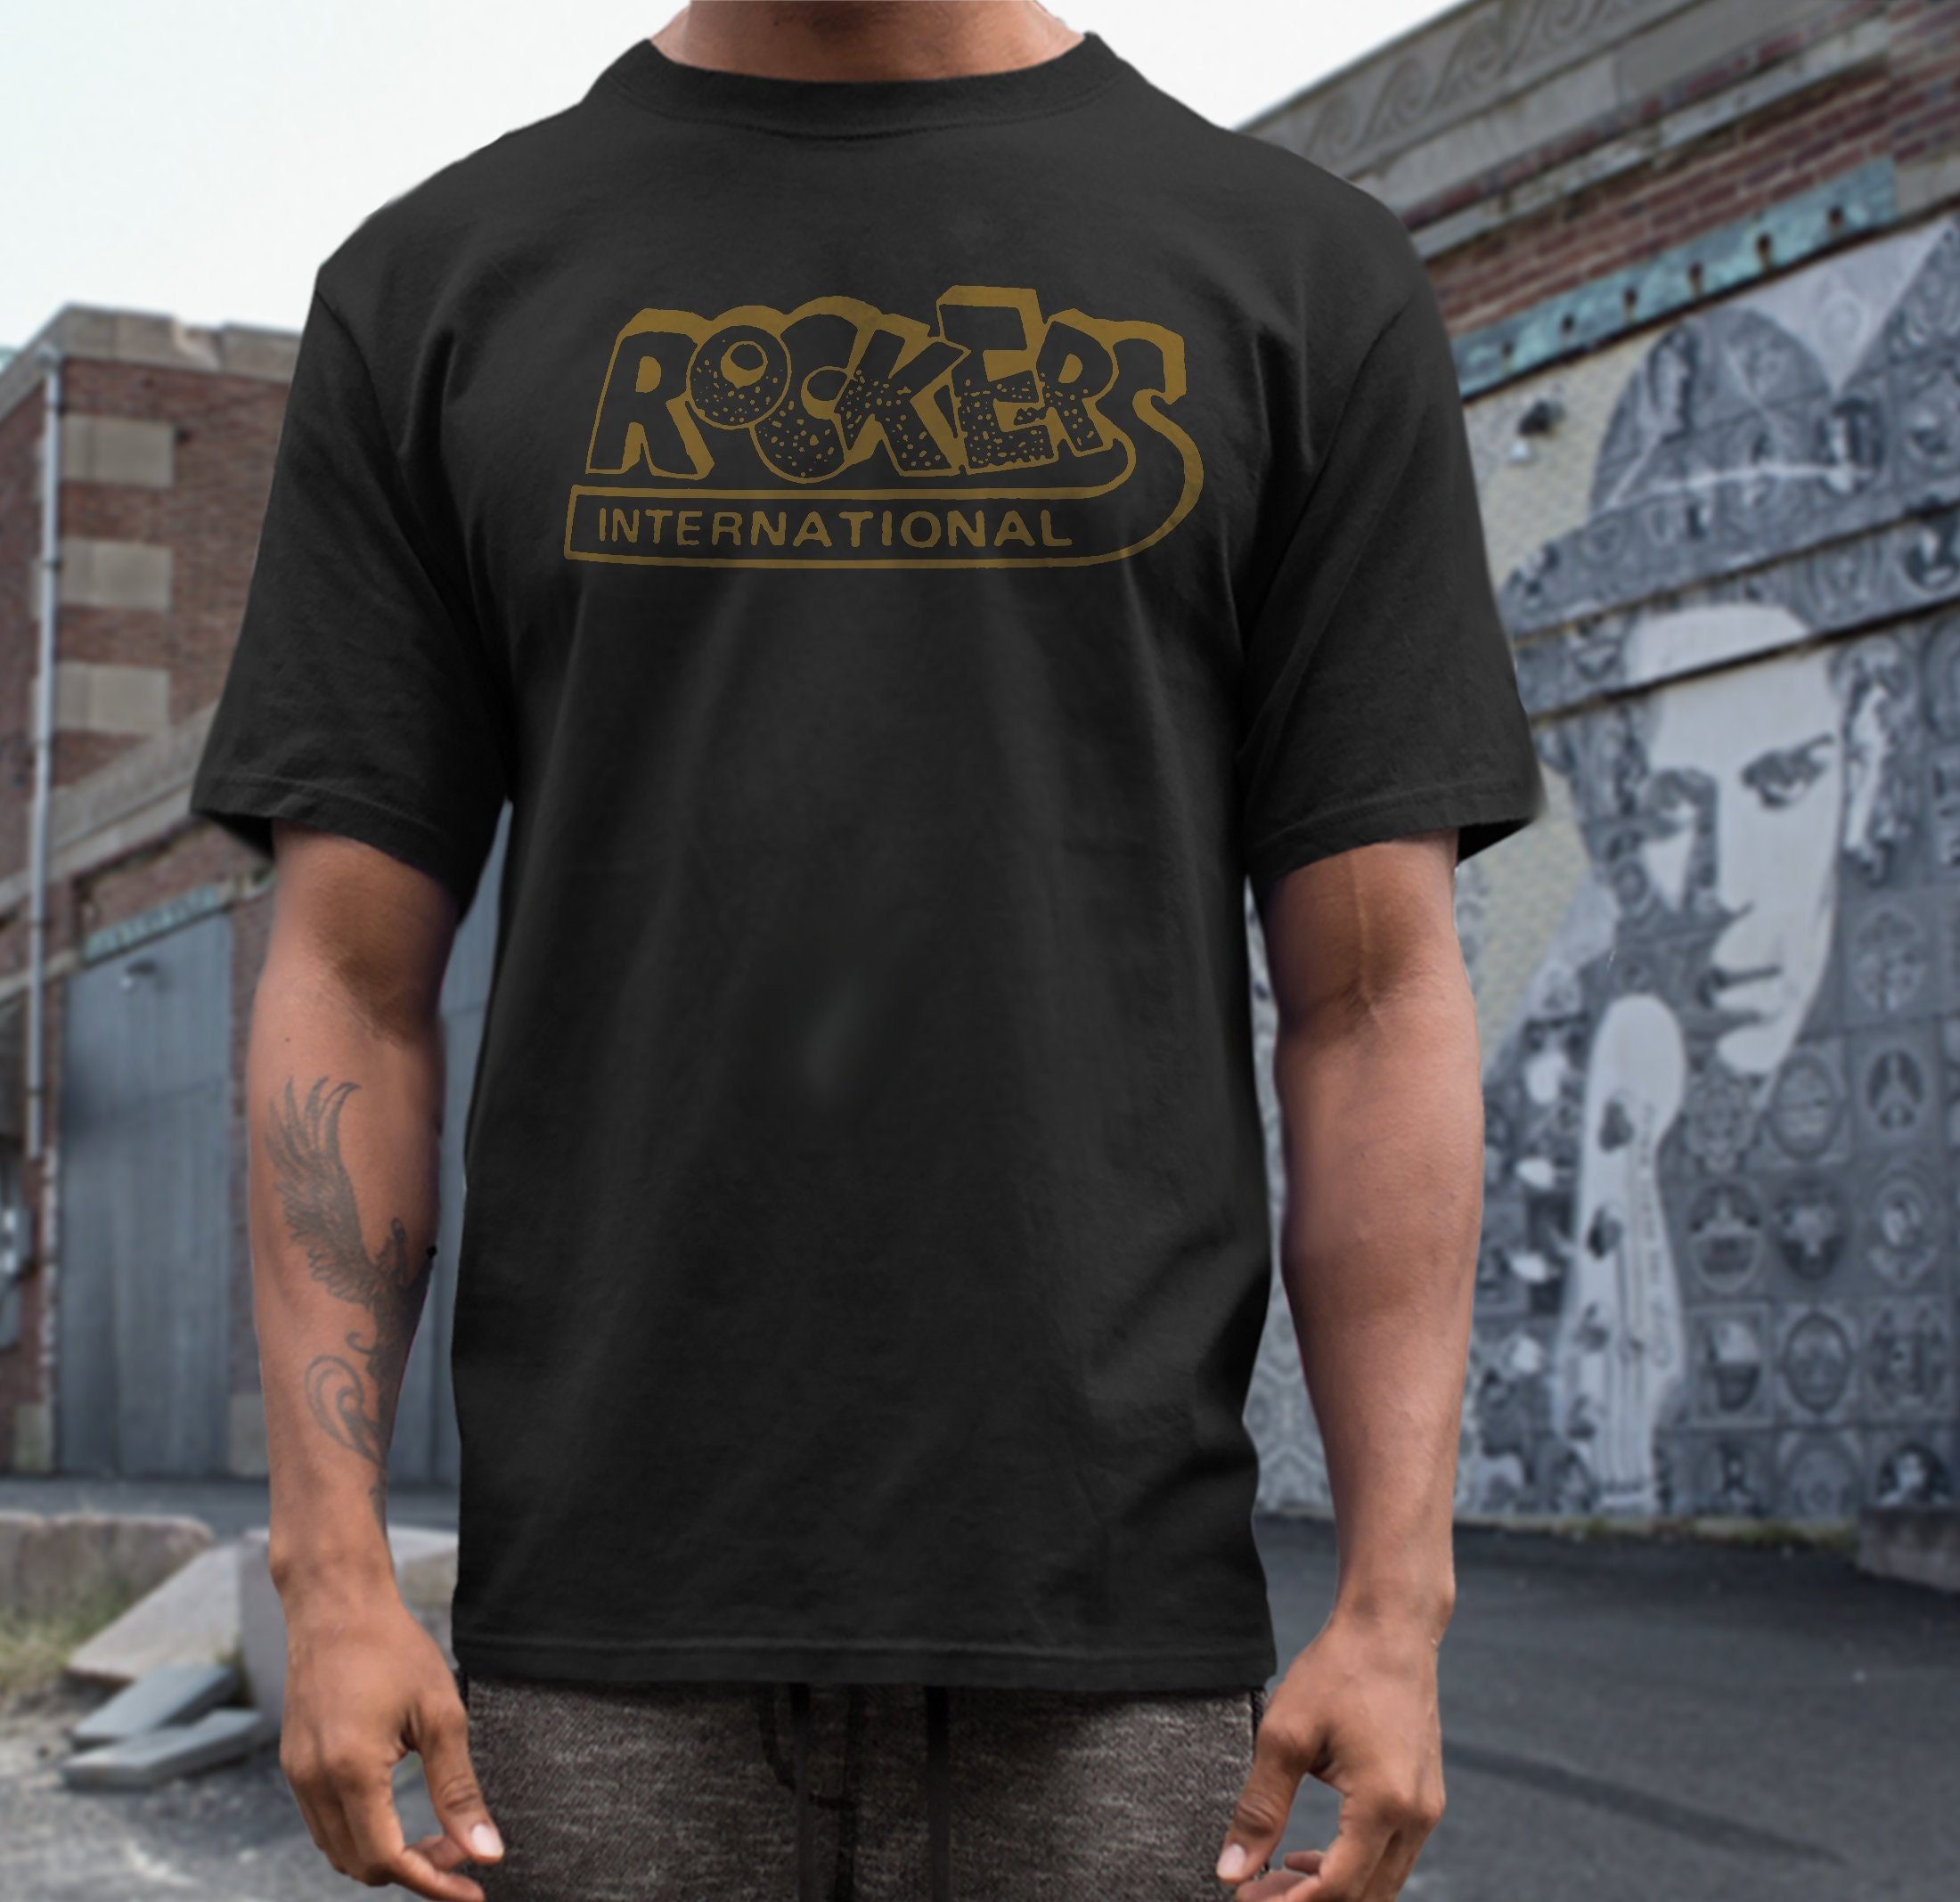 Rockers Records T Shirt Screen Print Short Sleeve Shirt Etsy